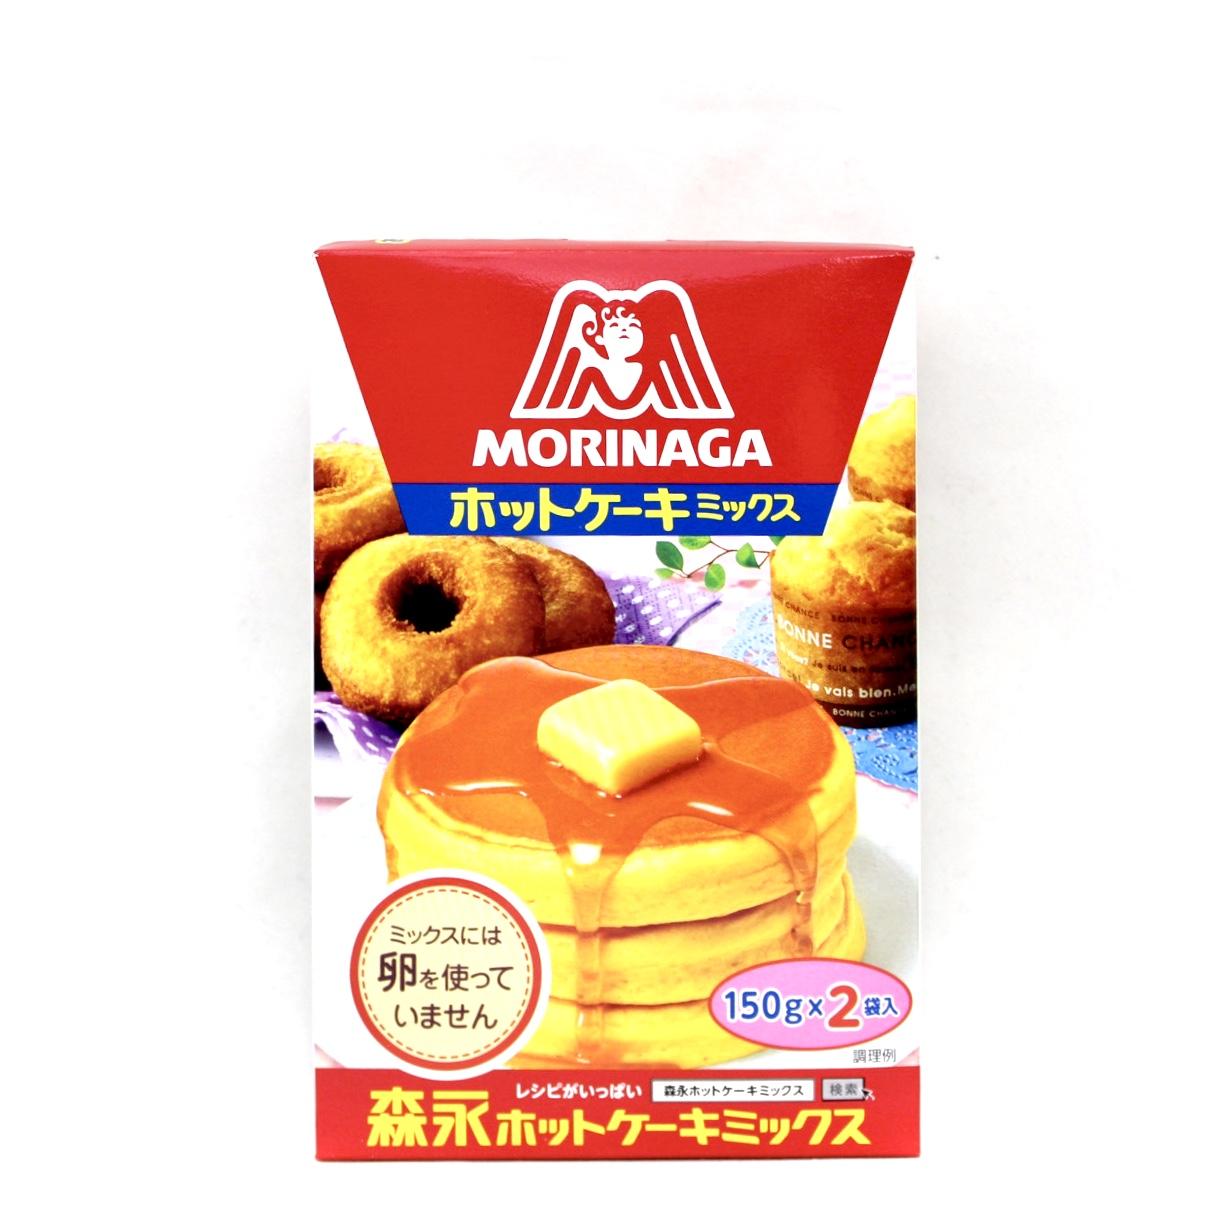 MORINAGA HOT CAKE MIX 300g